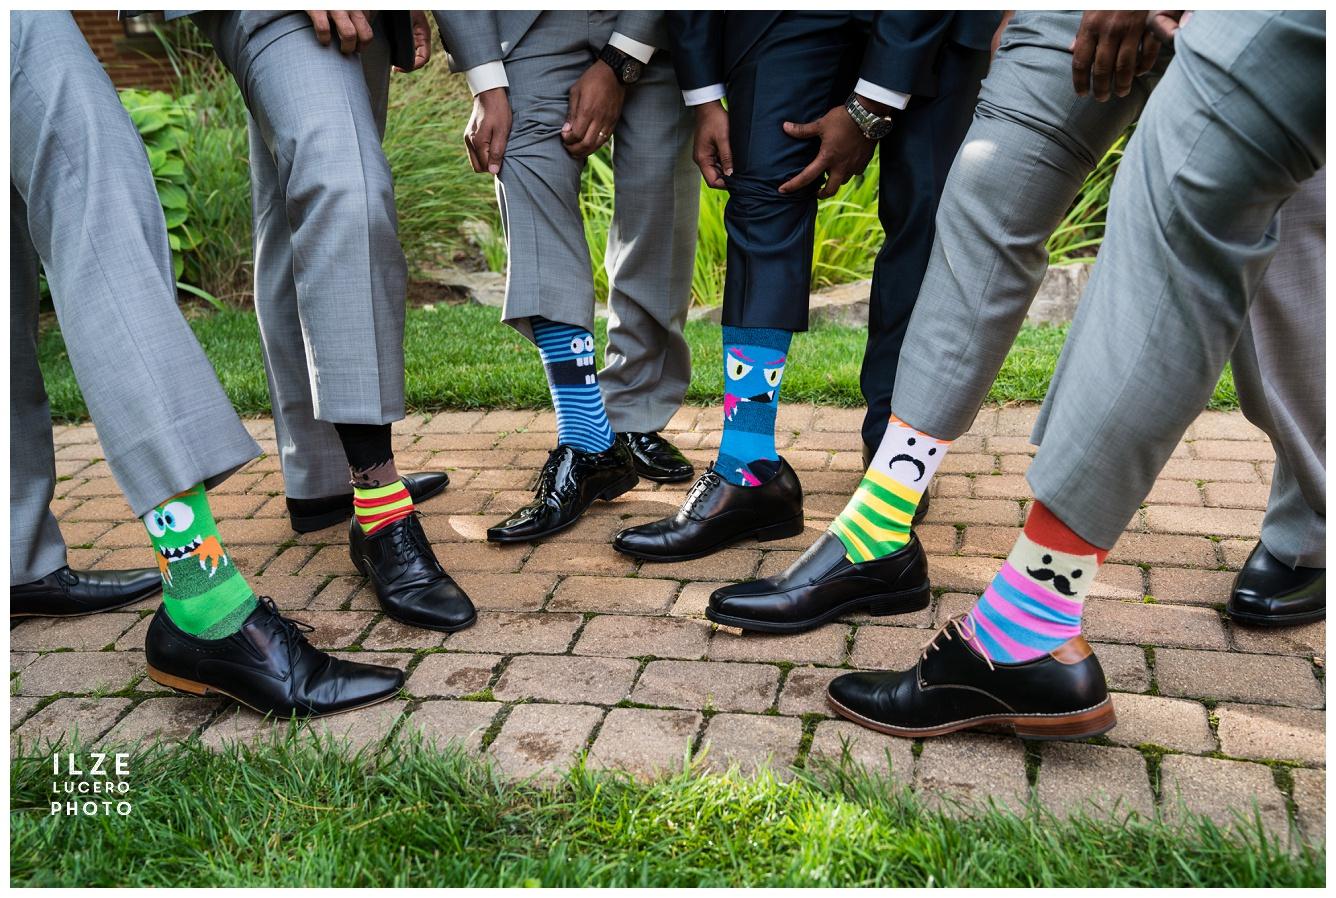 Wedding funny socks